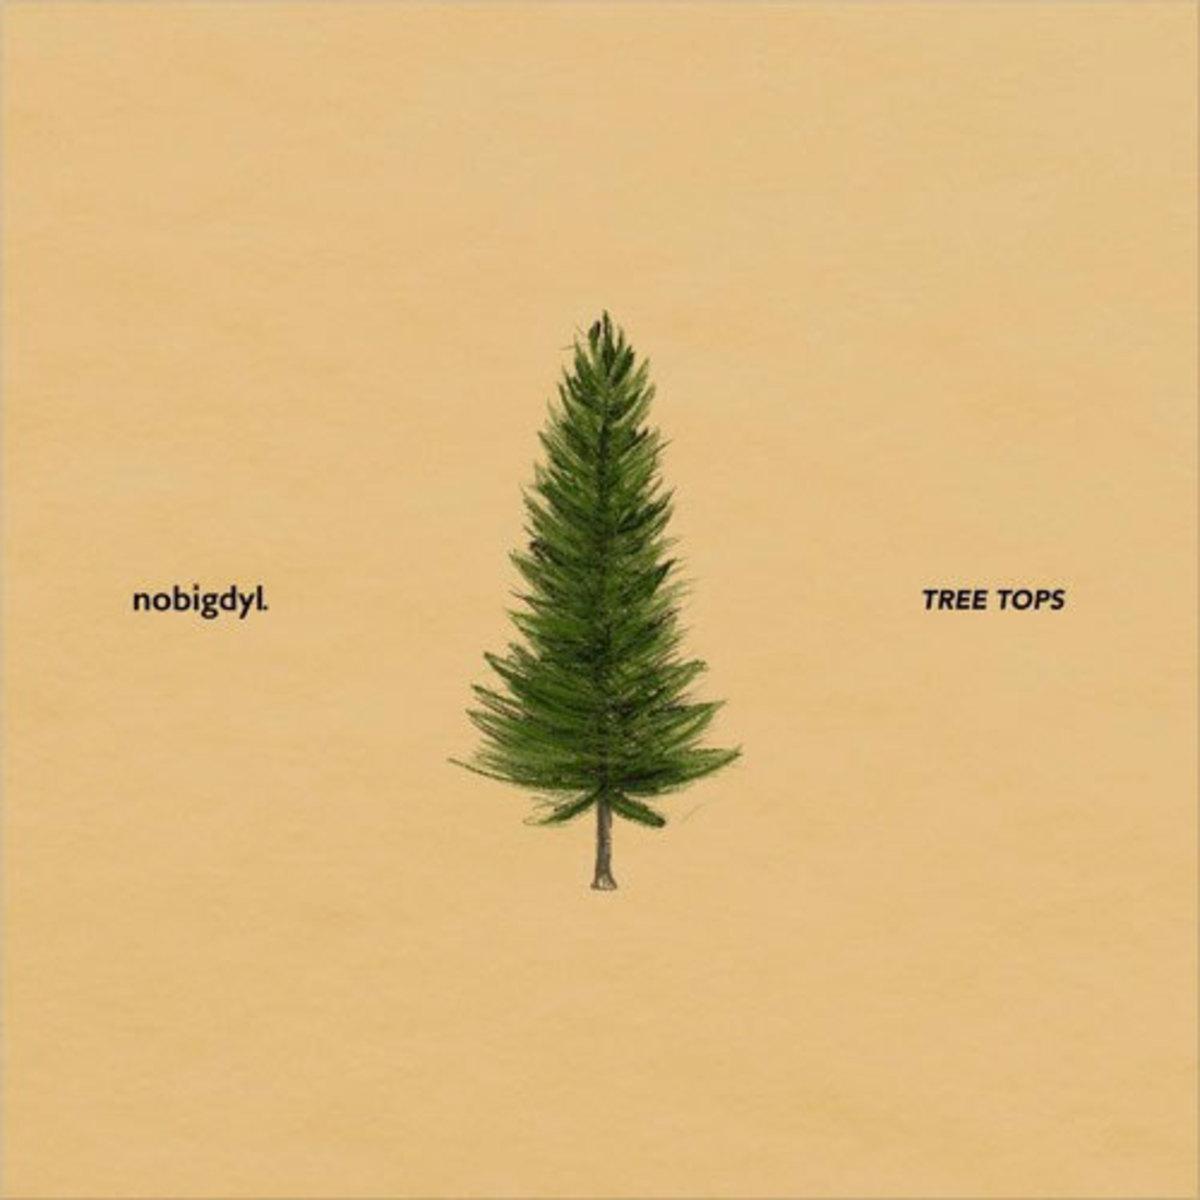 nobigdyl-tree-tops.jpg